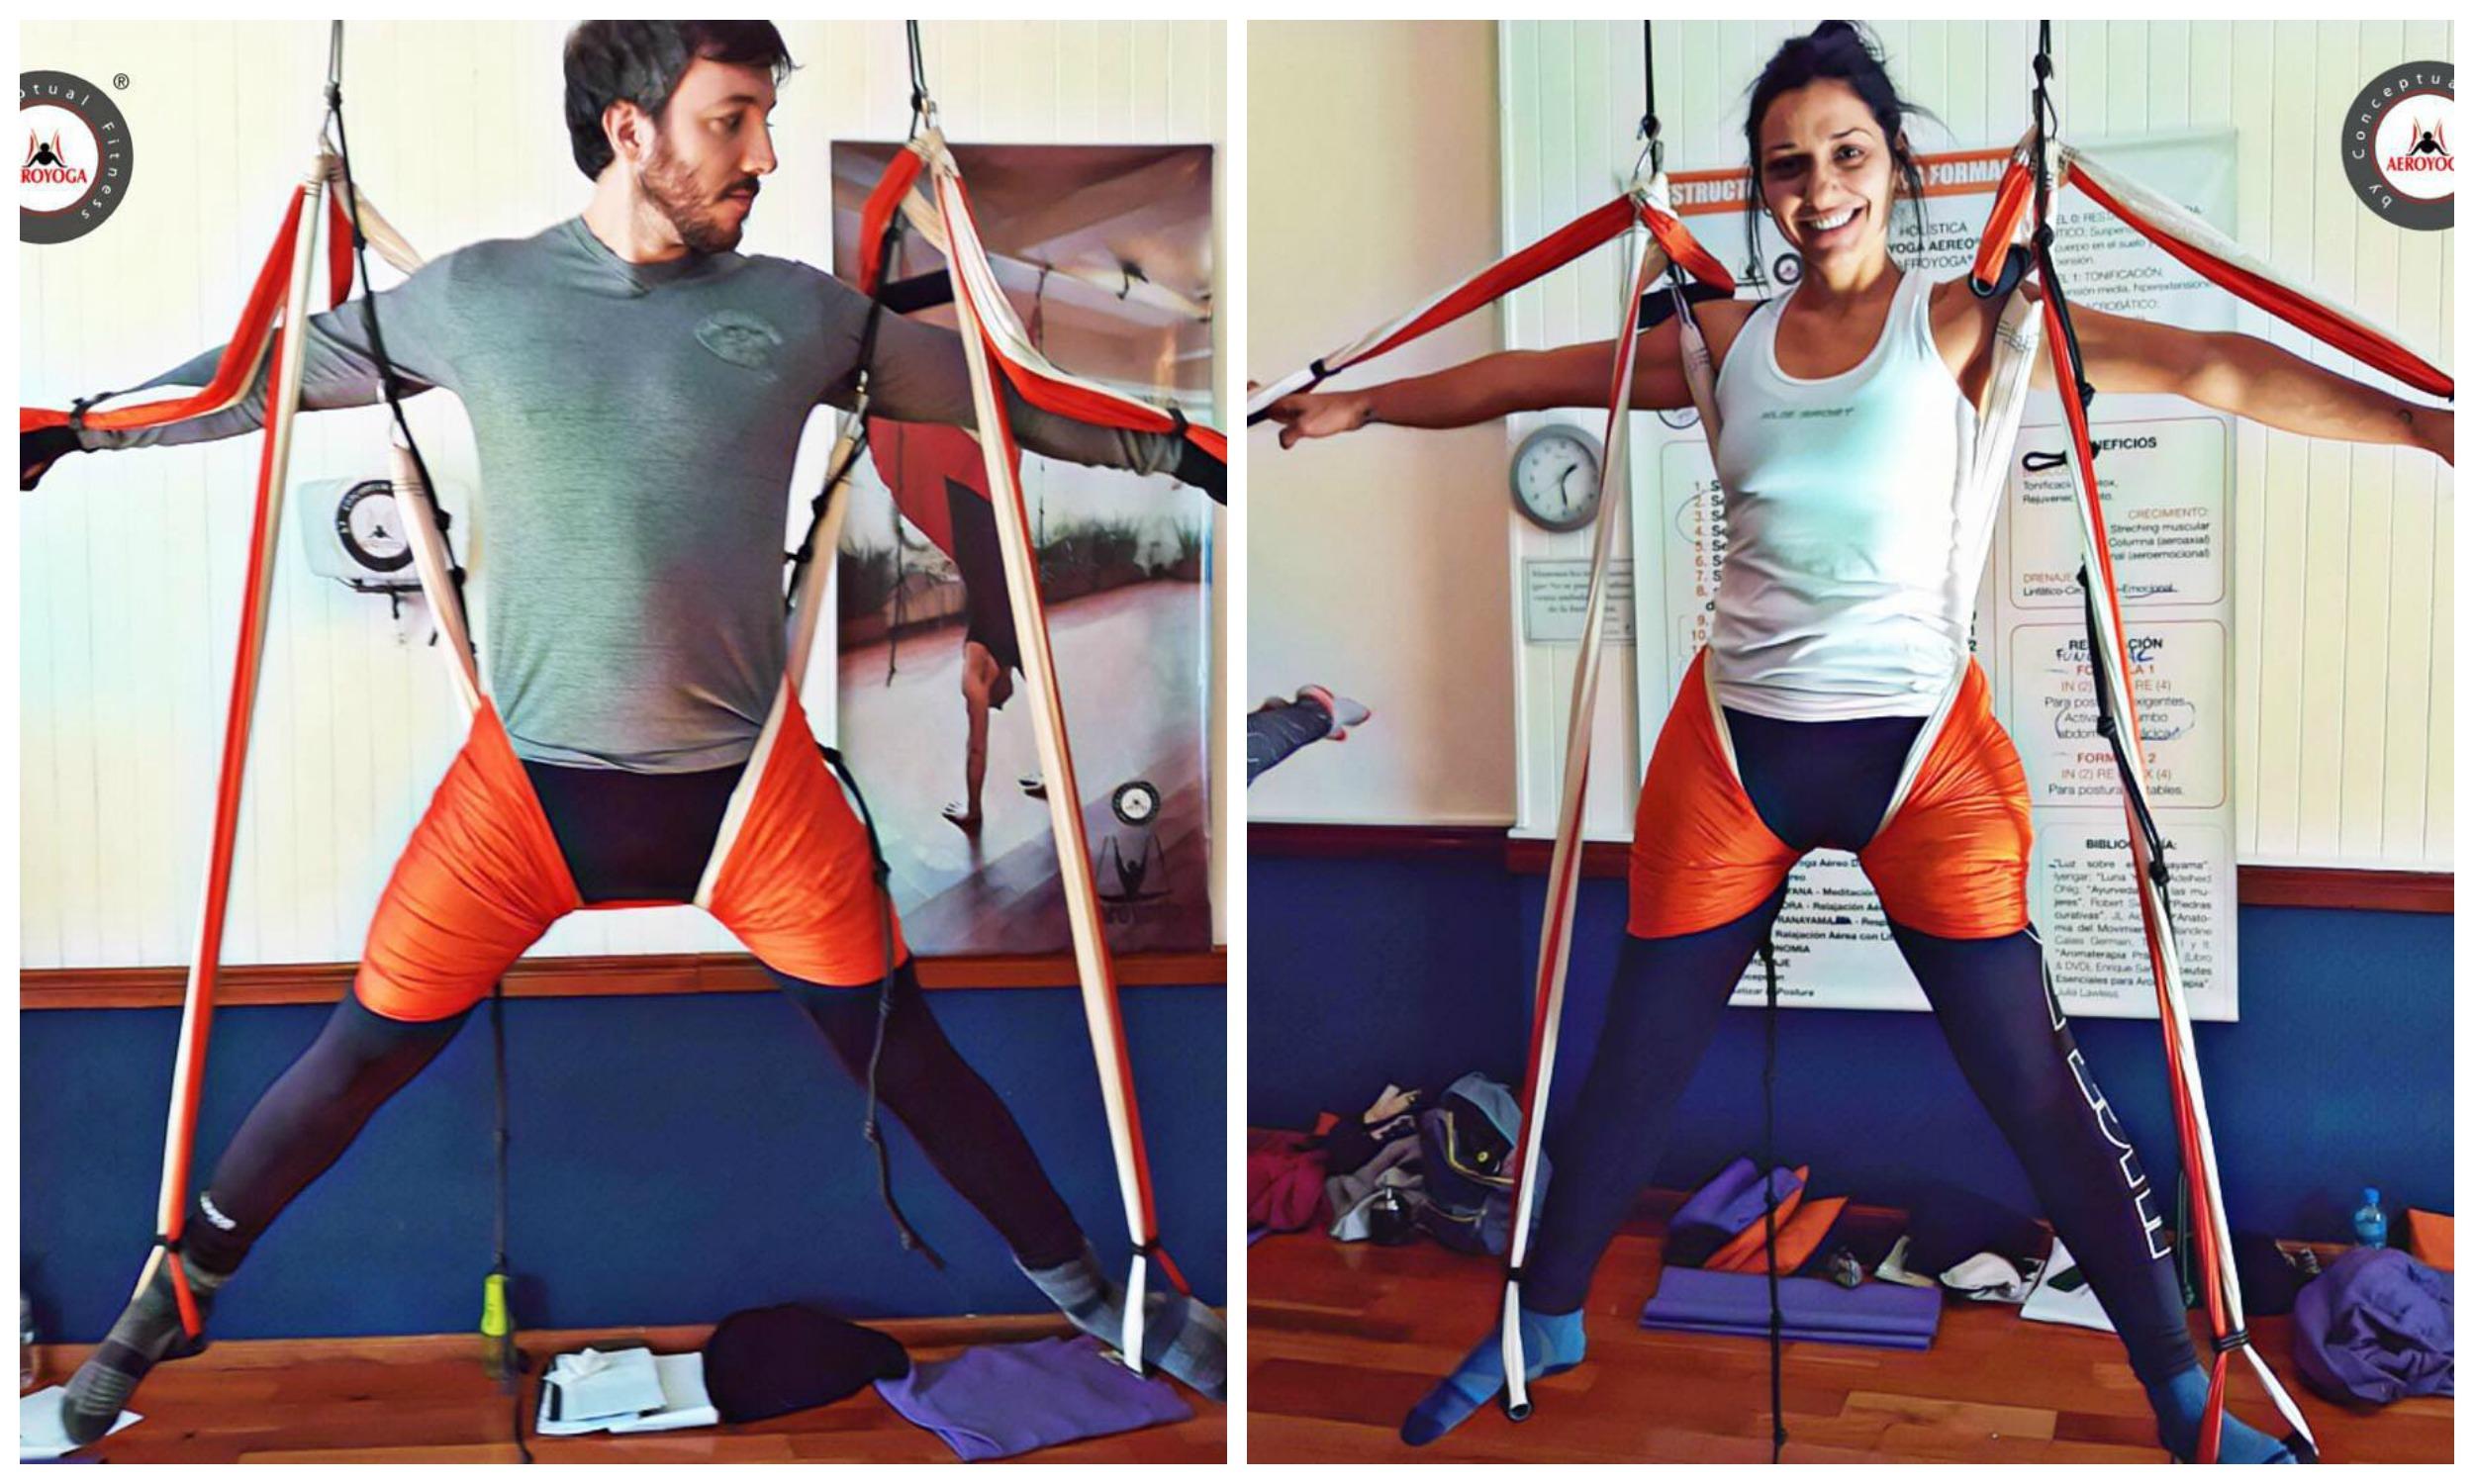 Yoga Aéreo, Descubre Hoy la Postura del Vitruvio con AeroYoga ®